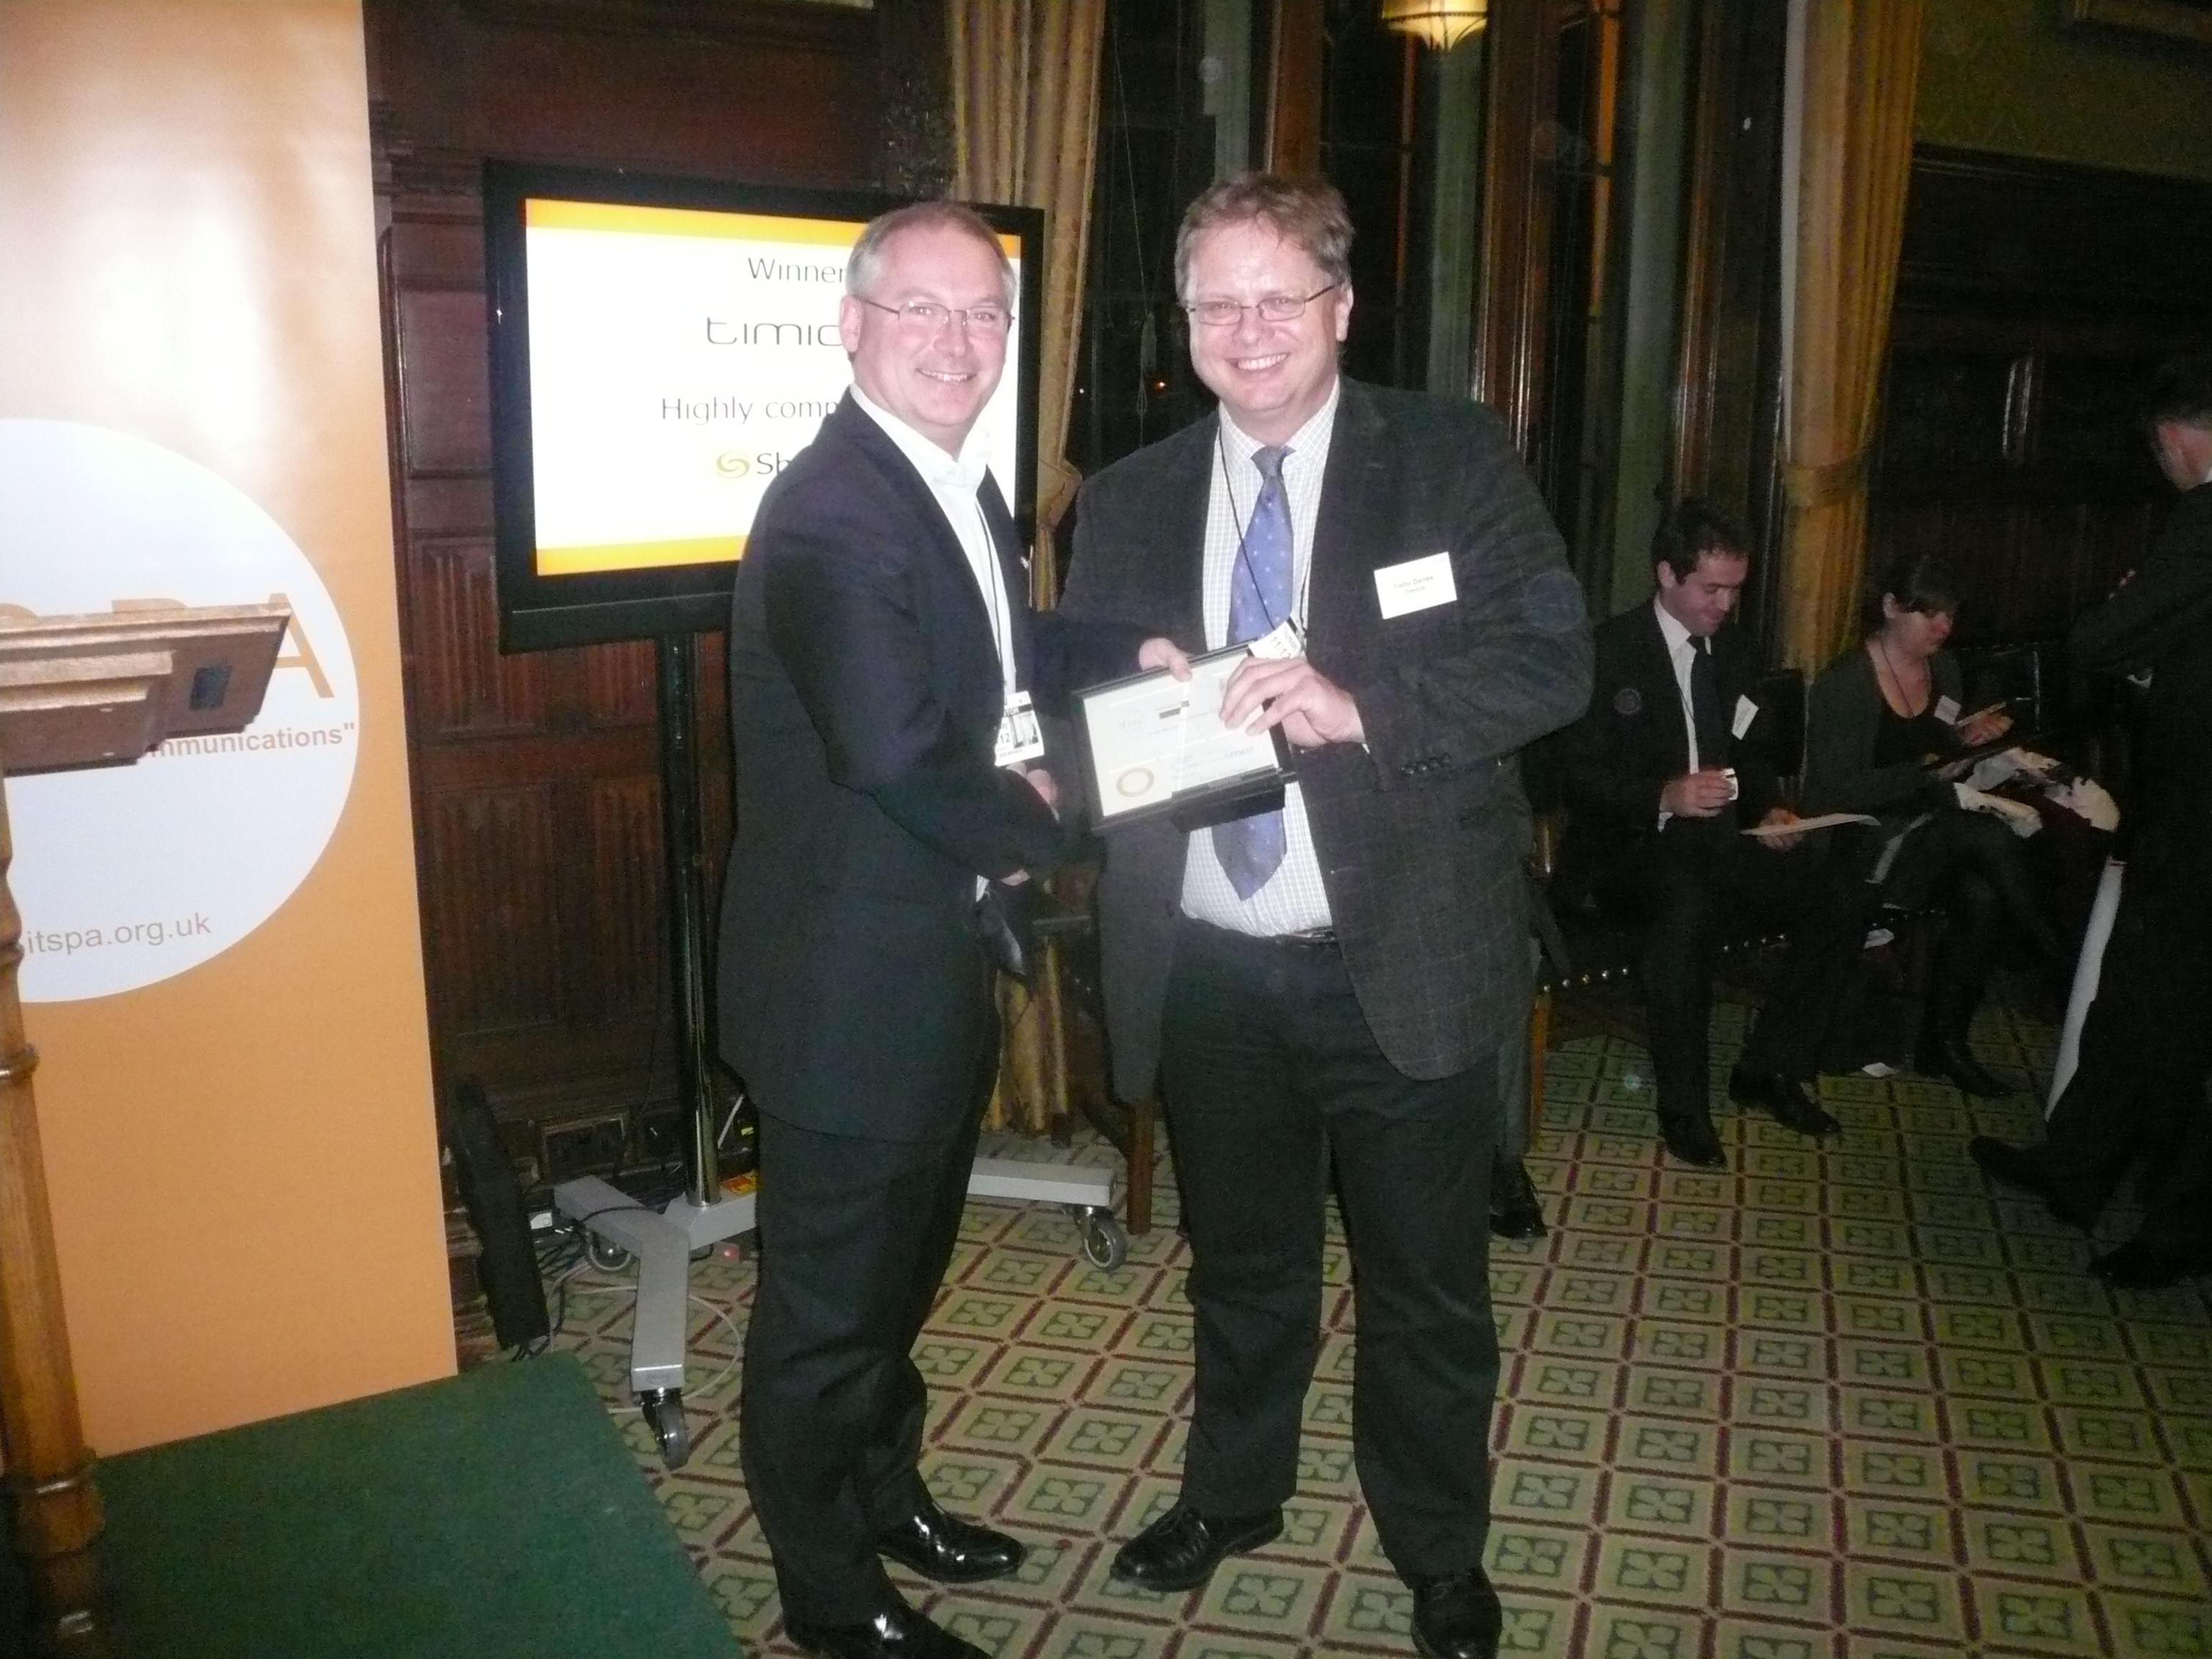 Tref accepts the ITSPA Award